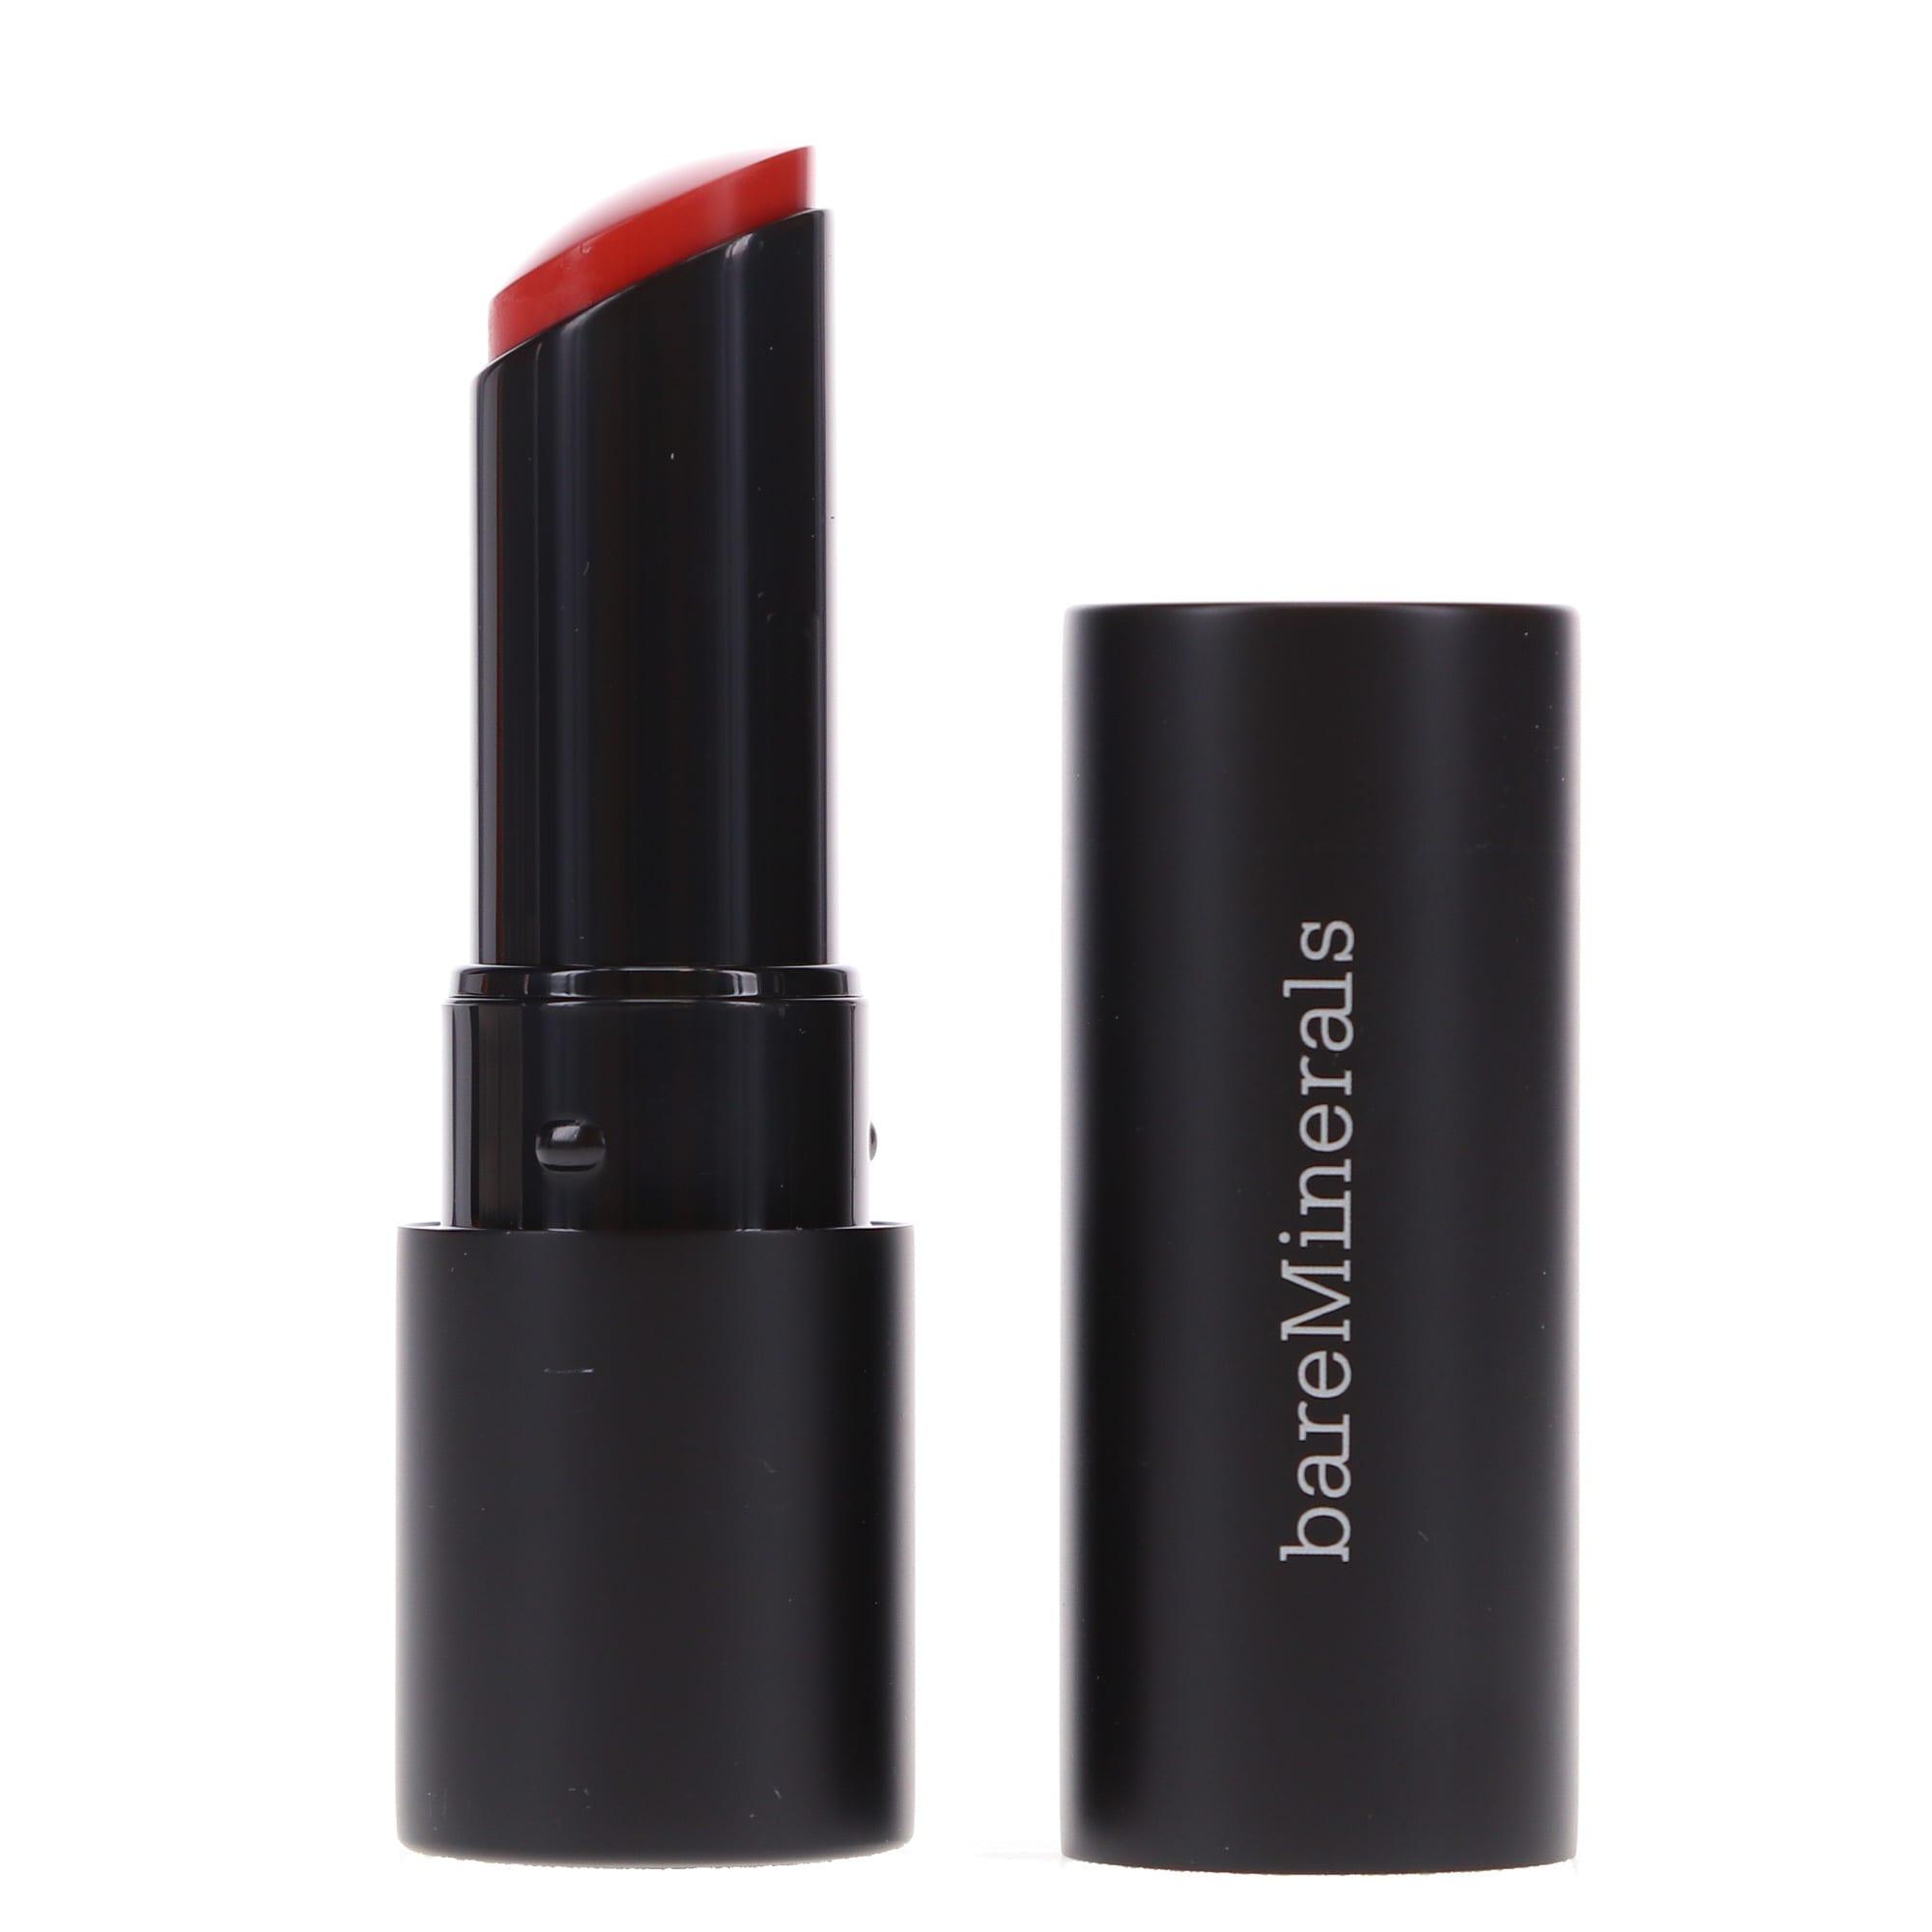 Bareminerals XOX Gen Nude Radiant Lipstick Set of 3 Shades